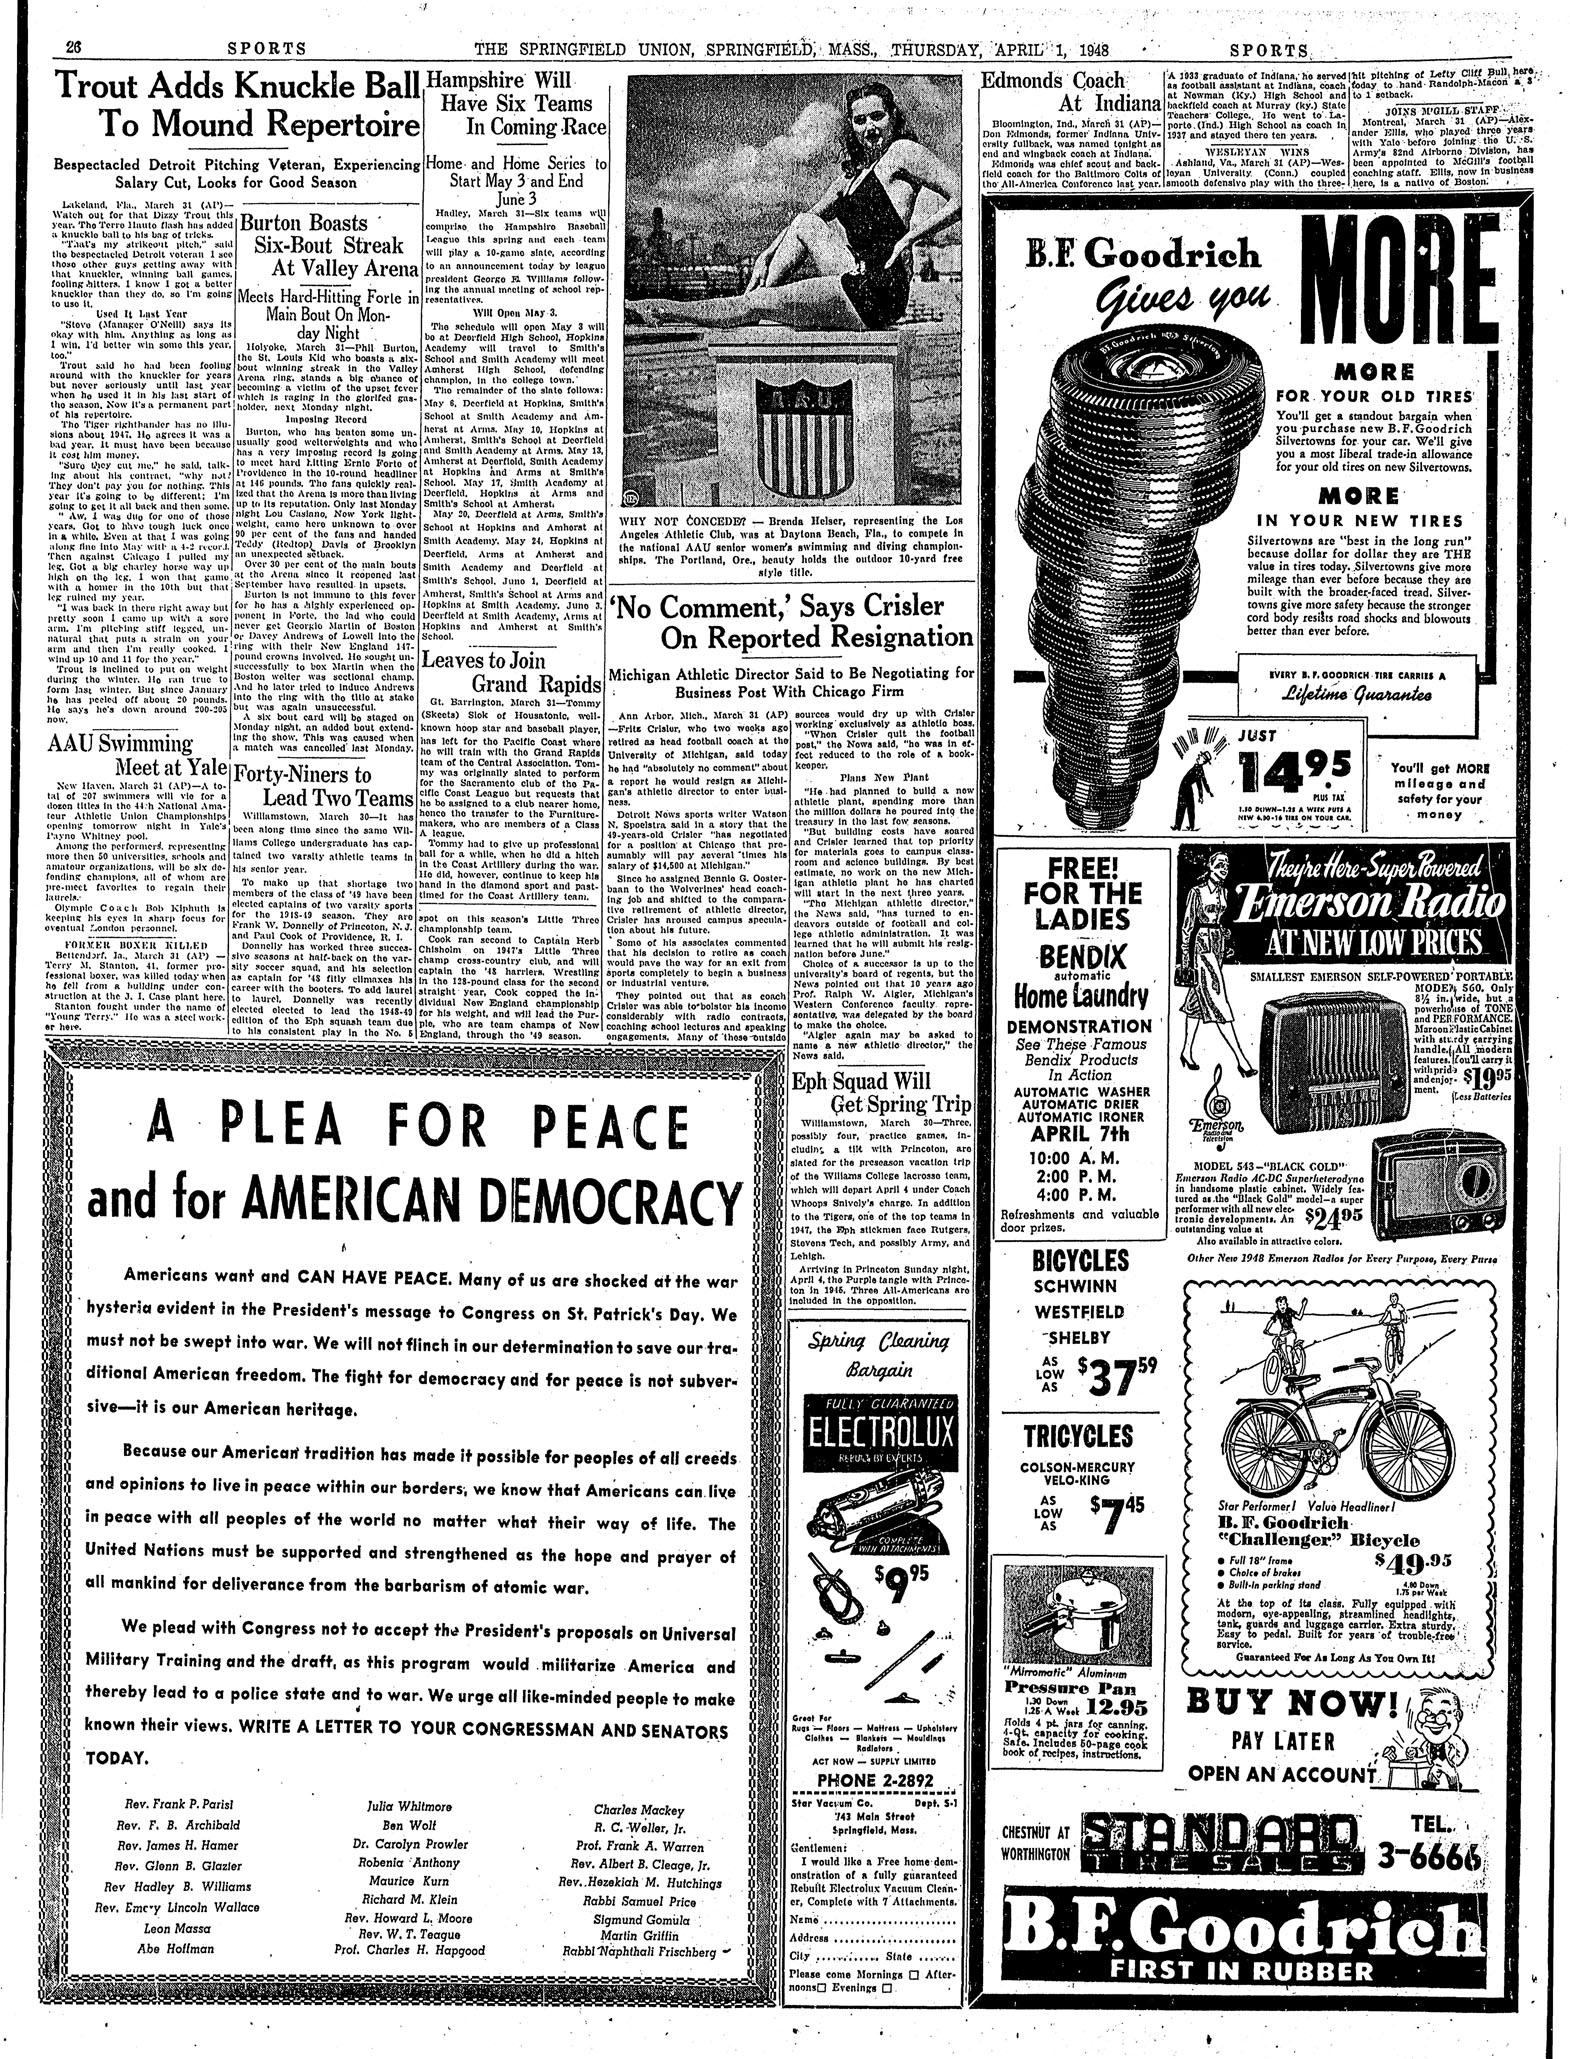 4_1_1948_peace_plea